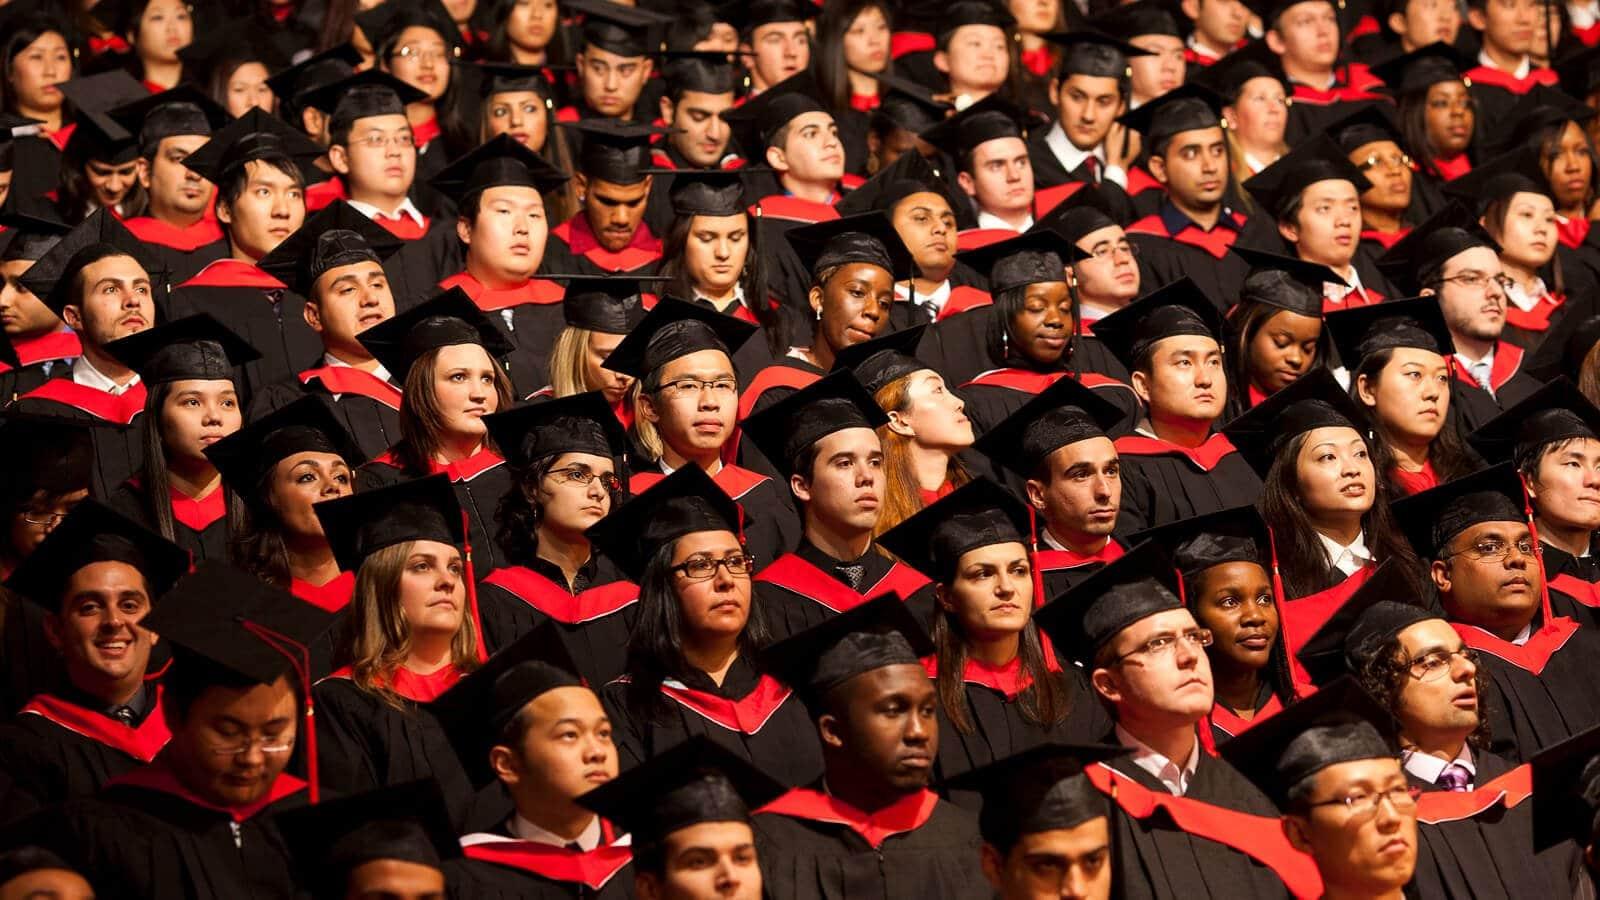 Graduation in Canada 2018.